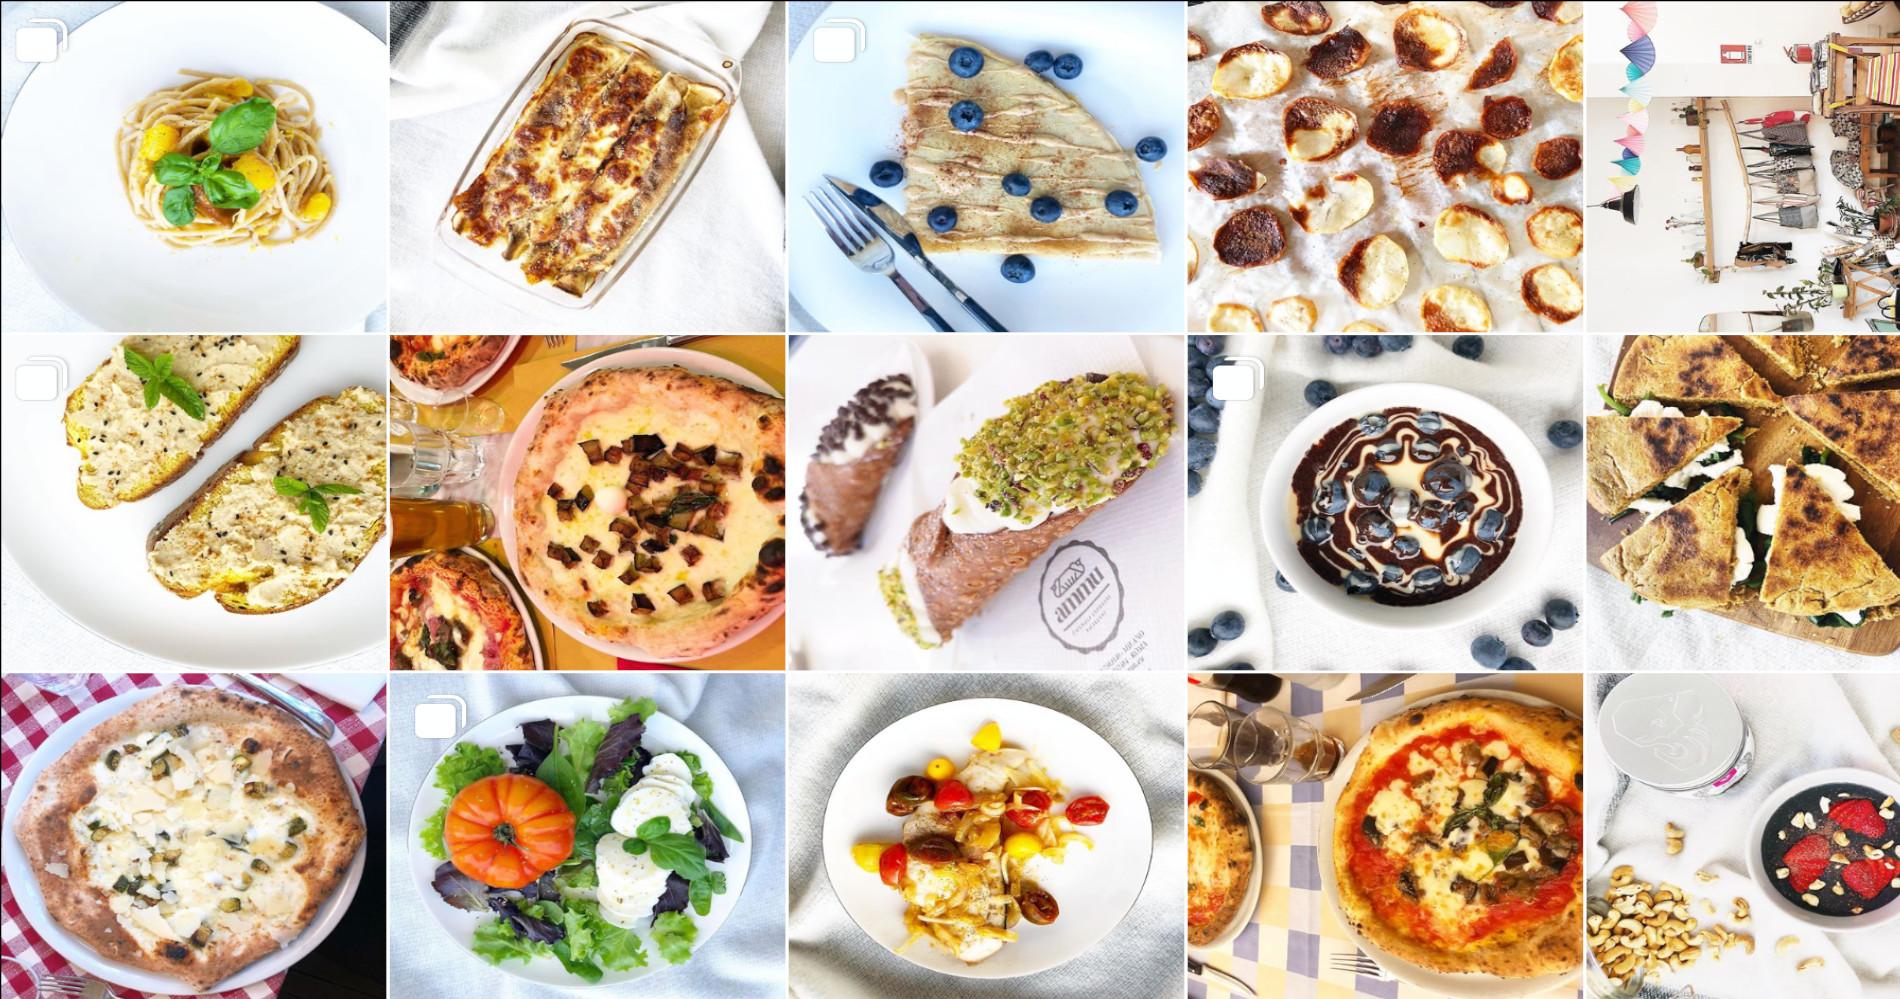 "<span class=""entry-title-primary"">Puntata in cucina: Intervista a @PolvereDiCannella</span> <span class=""entry-subtitle"">La food influencer Jessica Guglielmini si racconta.</span>"